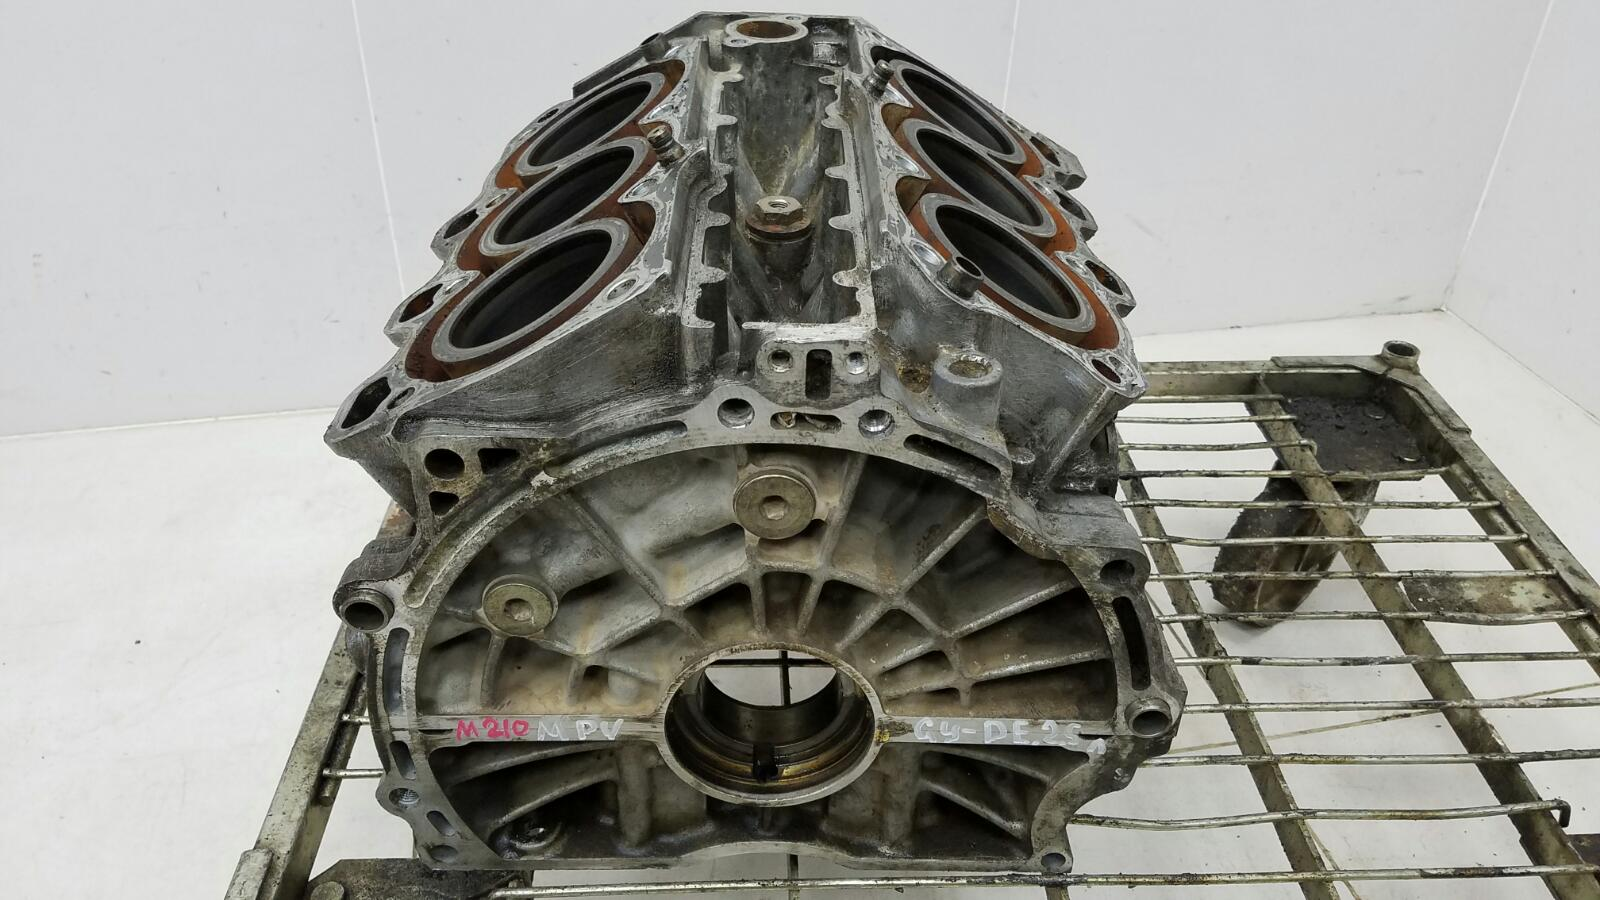 Блок двигателя двс Mazda Mpv 2 LW GYDE 2.5Л 2001